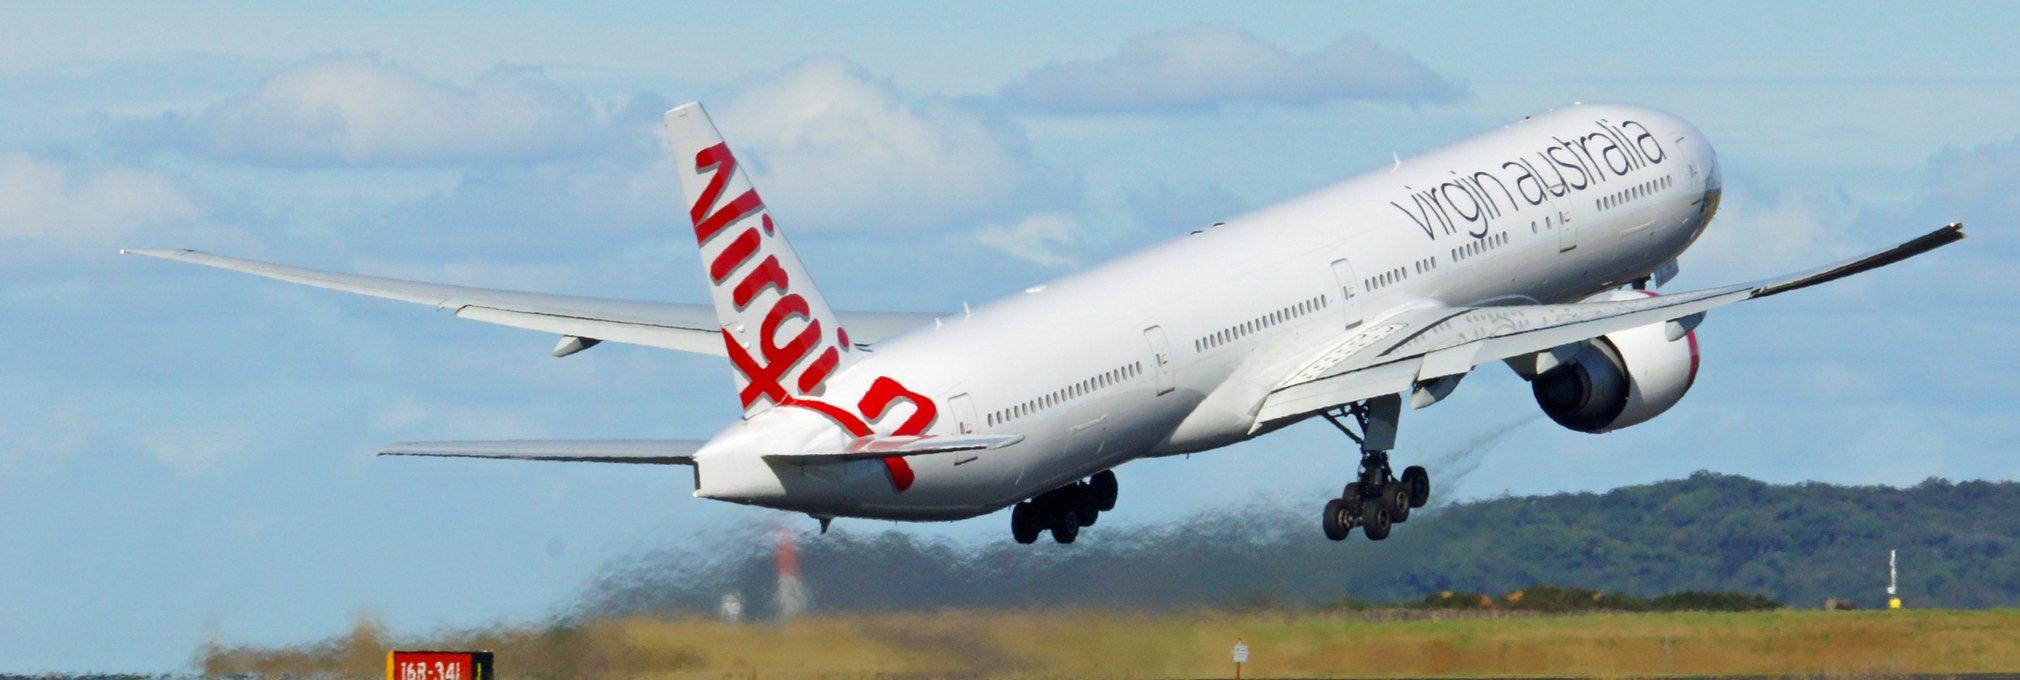 Cheap Virgin Australia Airlines Flights